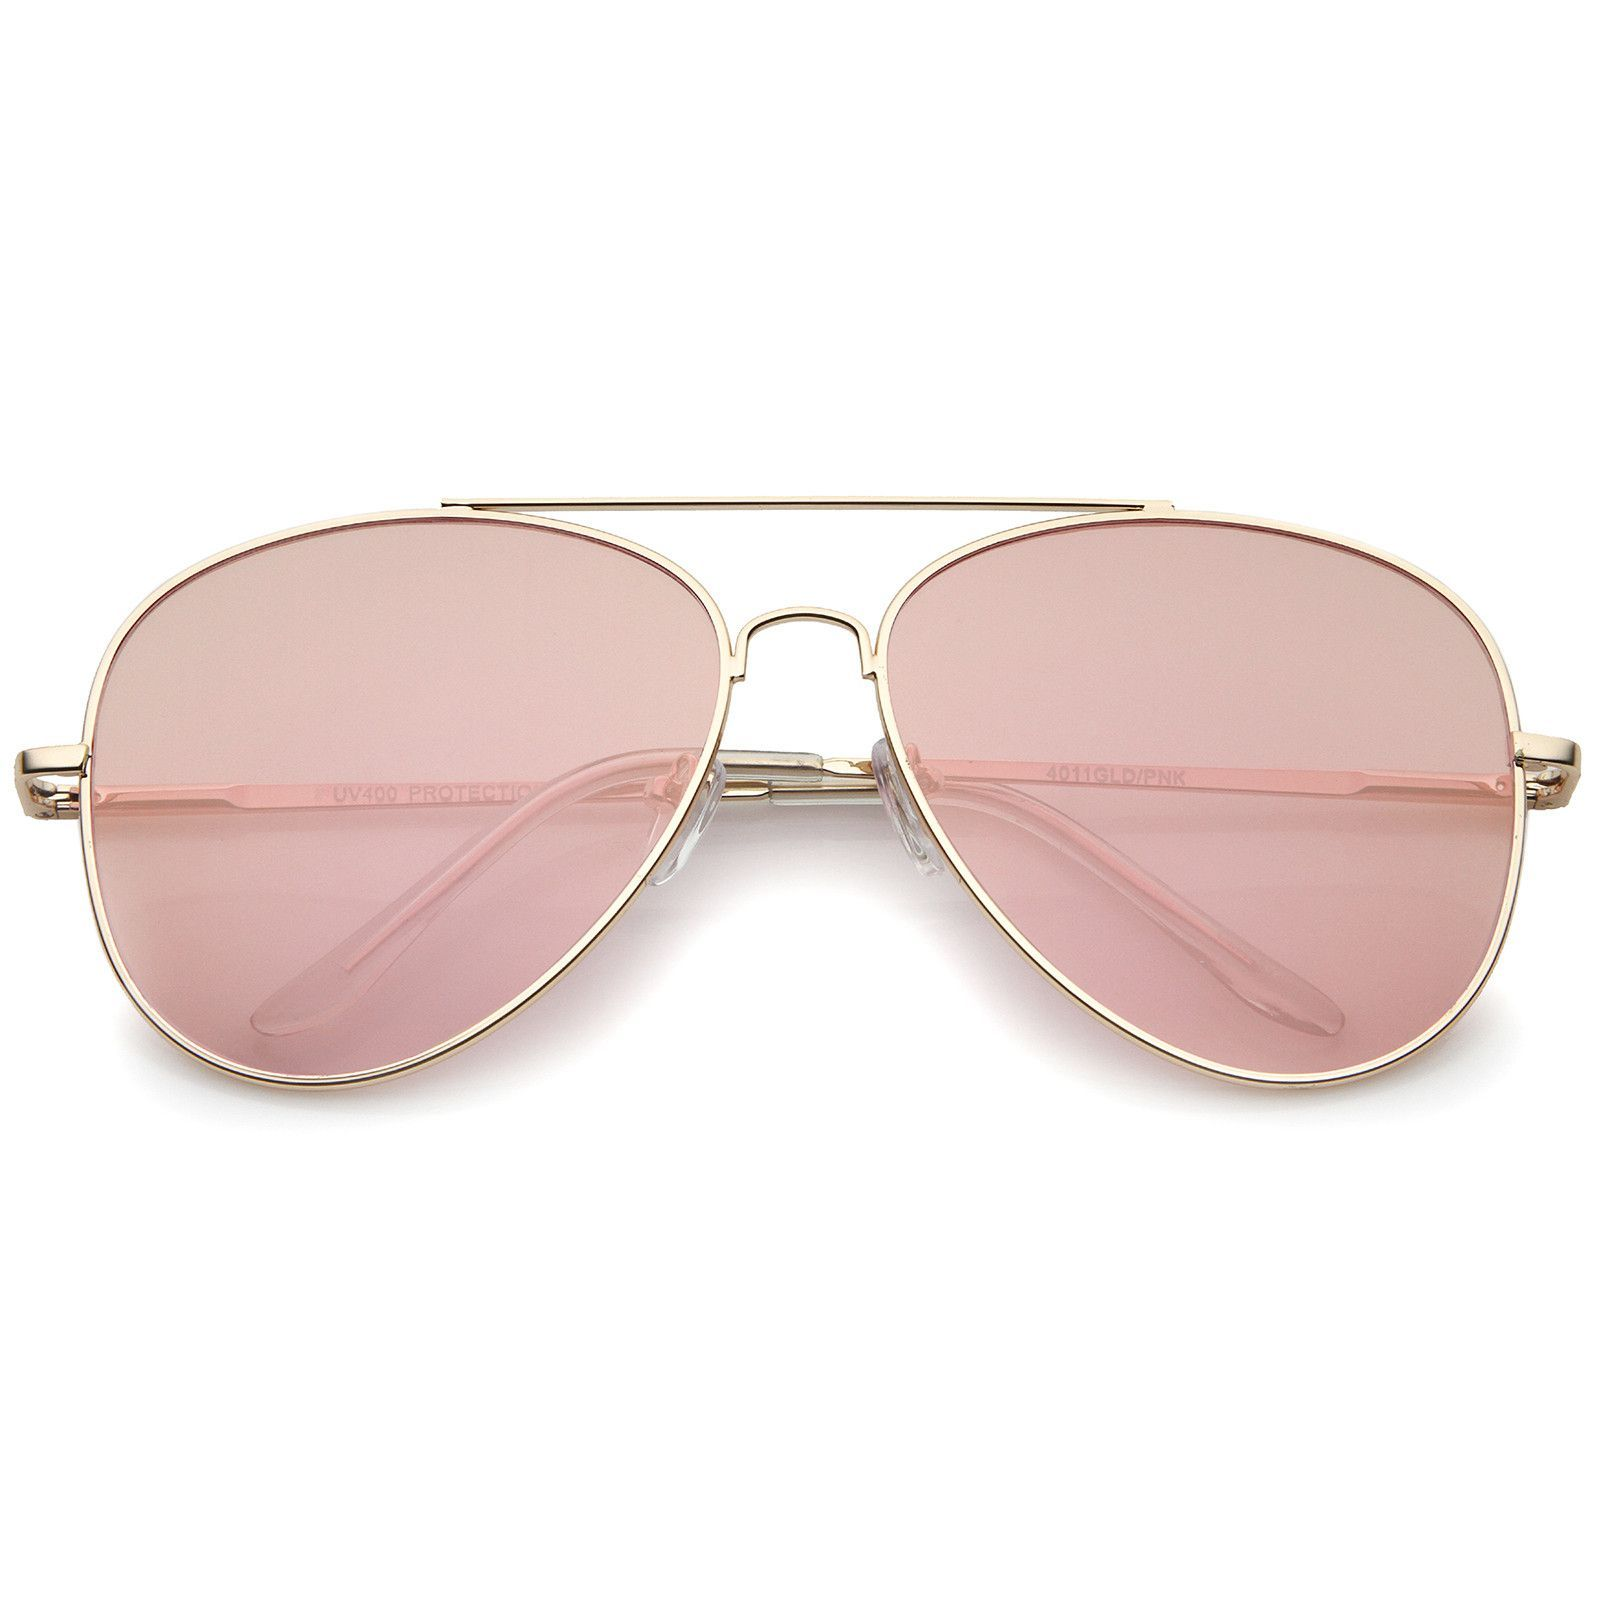 4f39f2b79b Large Metal Rose Gold Frame Pink Mirror Flat Lens Aviator Sunglasses 60mm